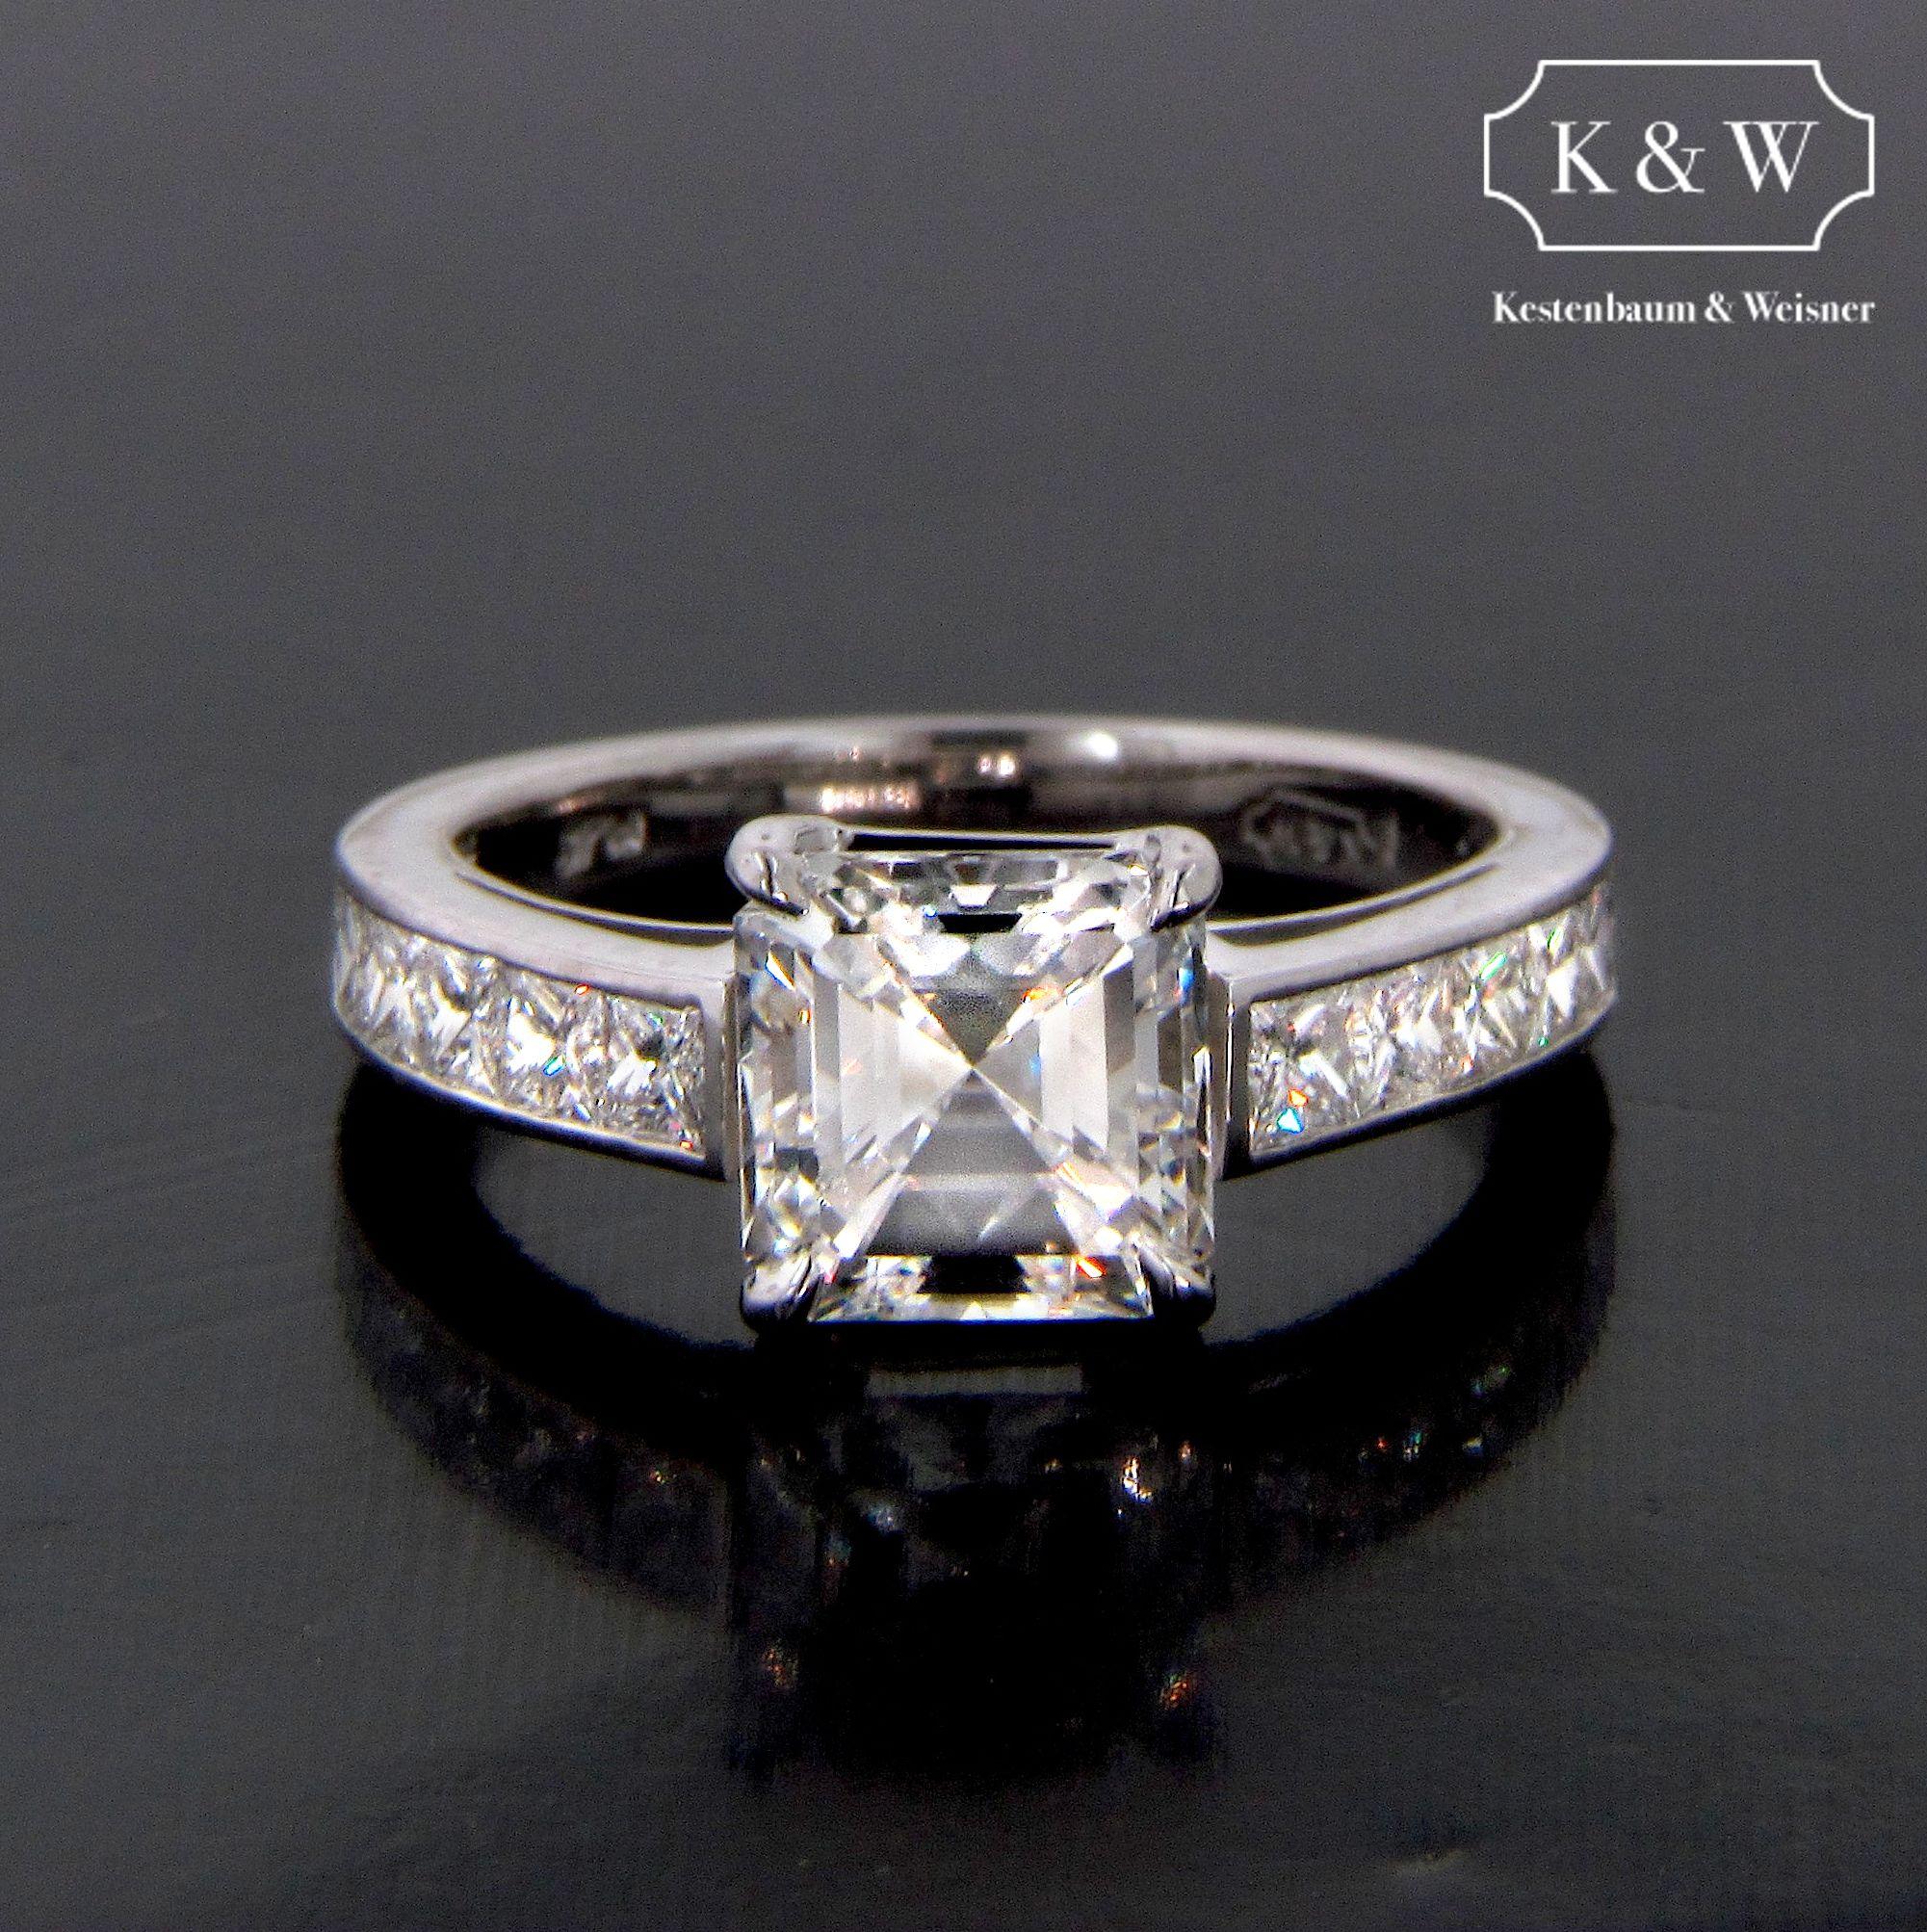 Chic #AsscherCut ring with Channel Set #EternityBand #engagementrings #kwdiamonds